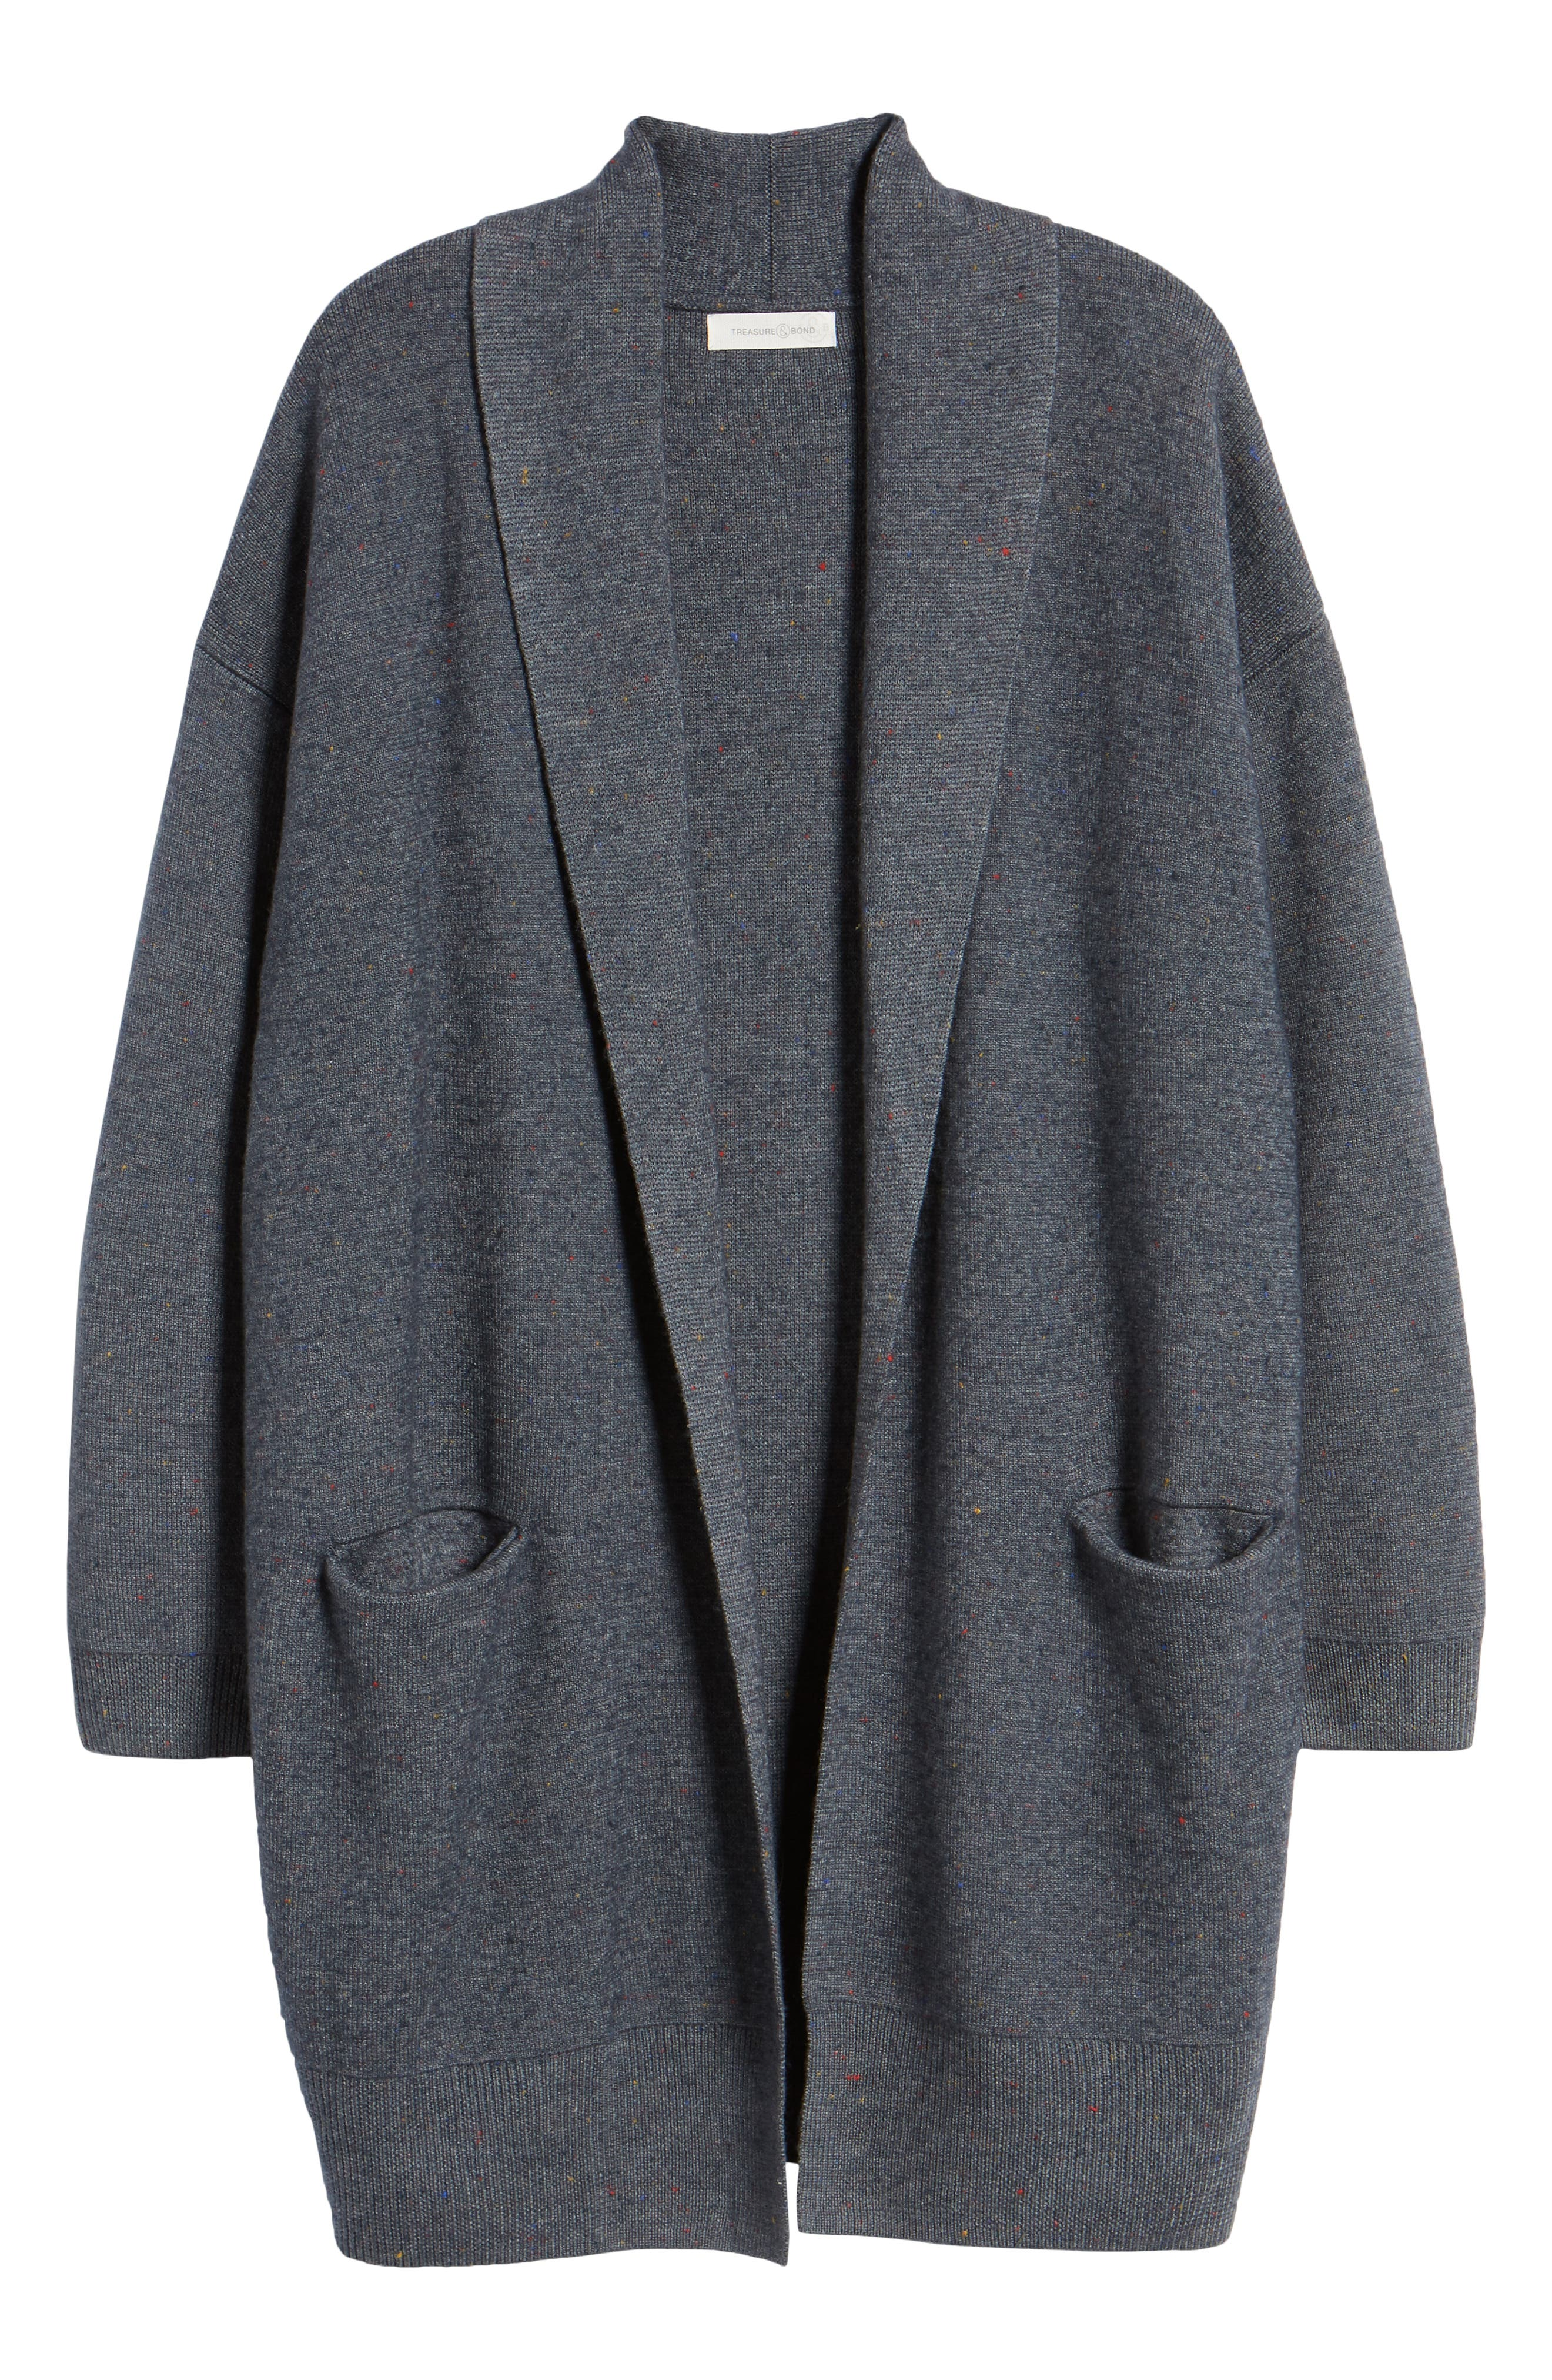 TREASURE & BOND,                             Boiled Wool Blend Long Cardigan,                             Alternate thumbnail 6, color,                             030